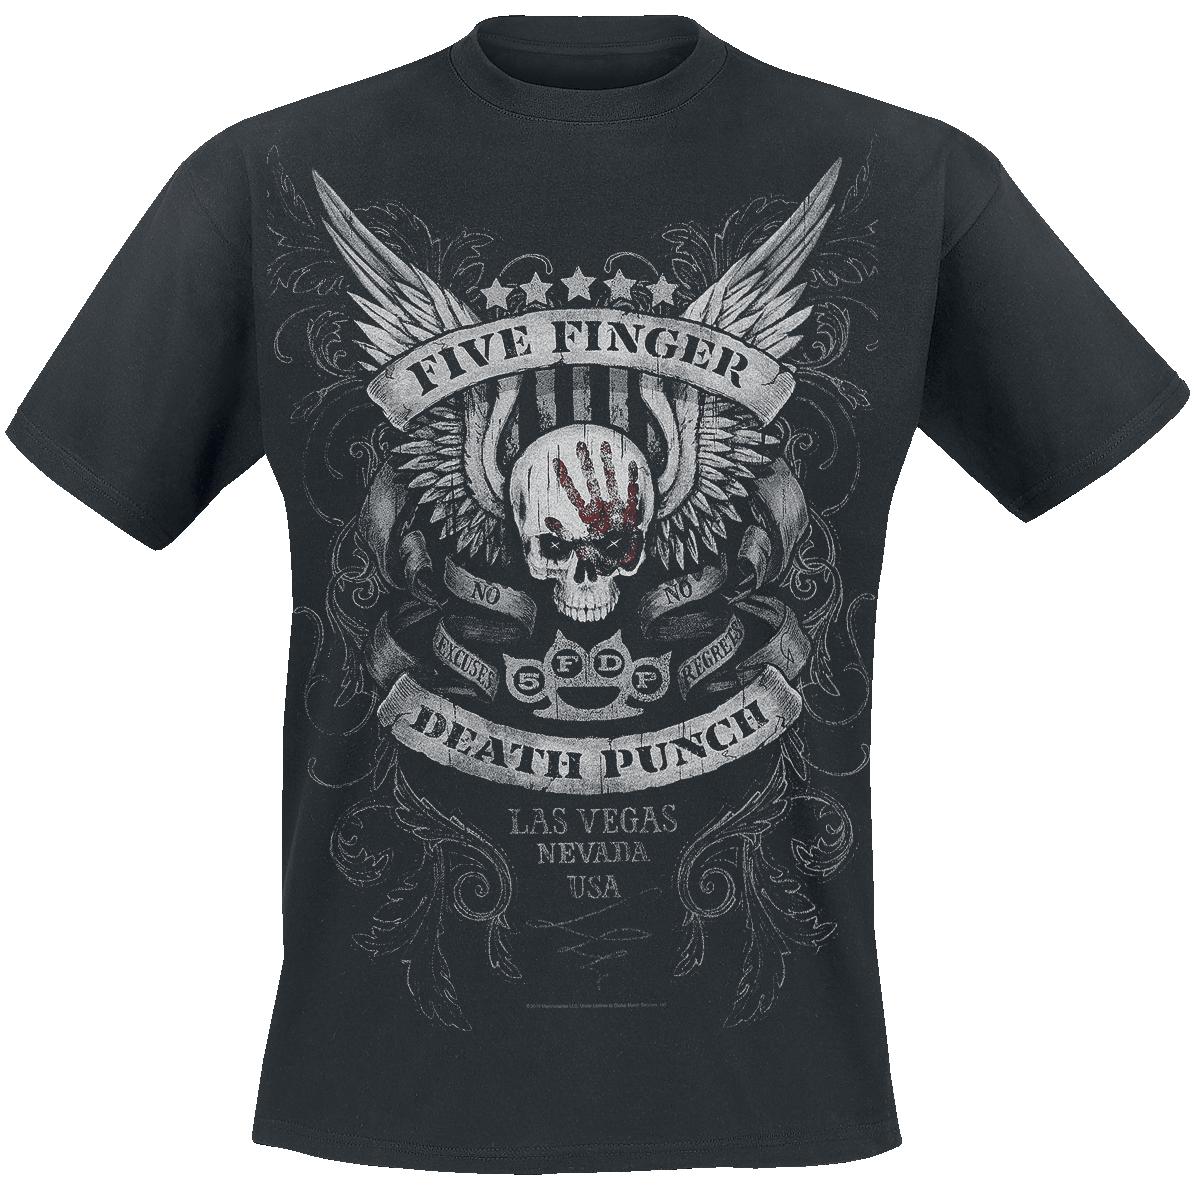 Five Finger Death Punch - No Regrets - T-Shirt - black image